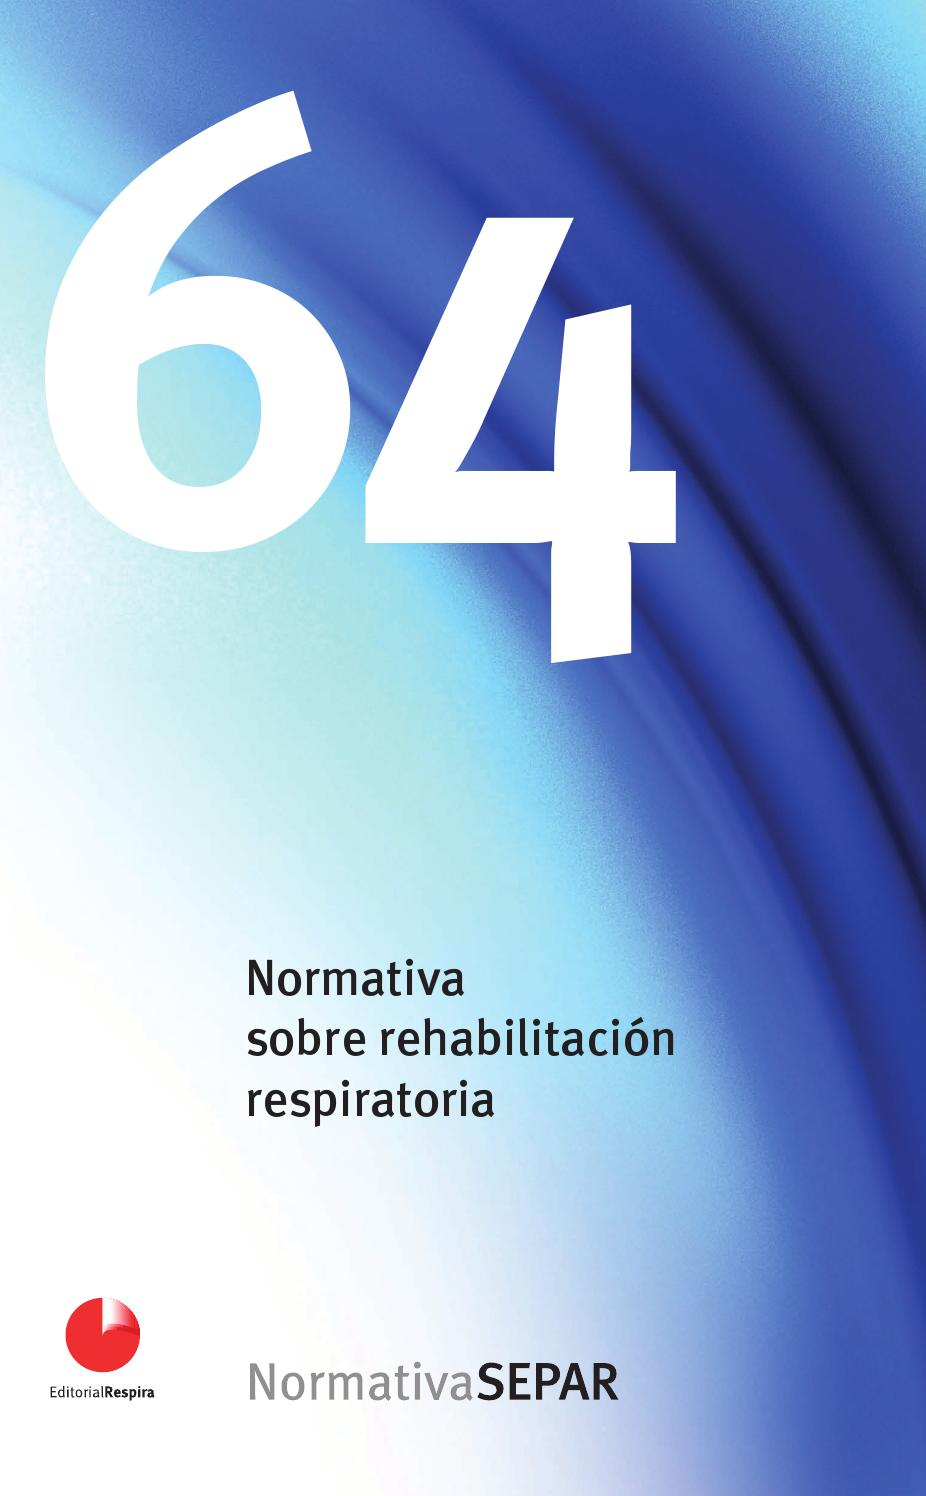 Normativa 64 sobre rehabilitación respiratoria by SEPAR - issuu